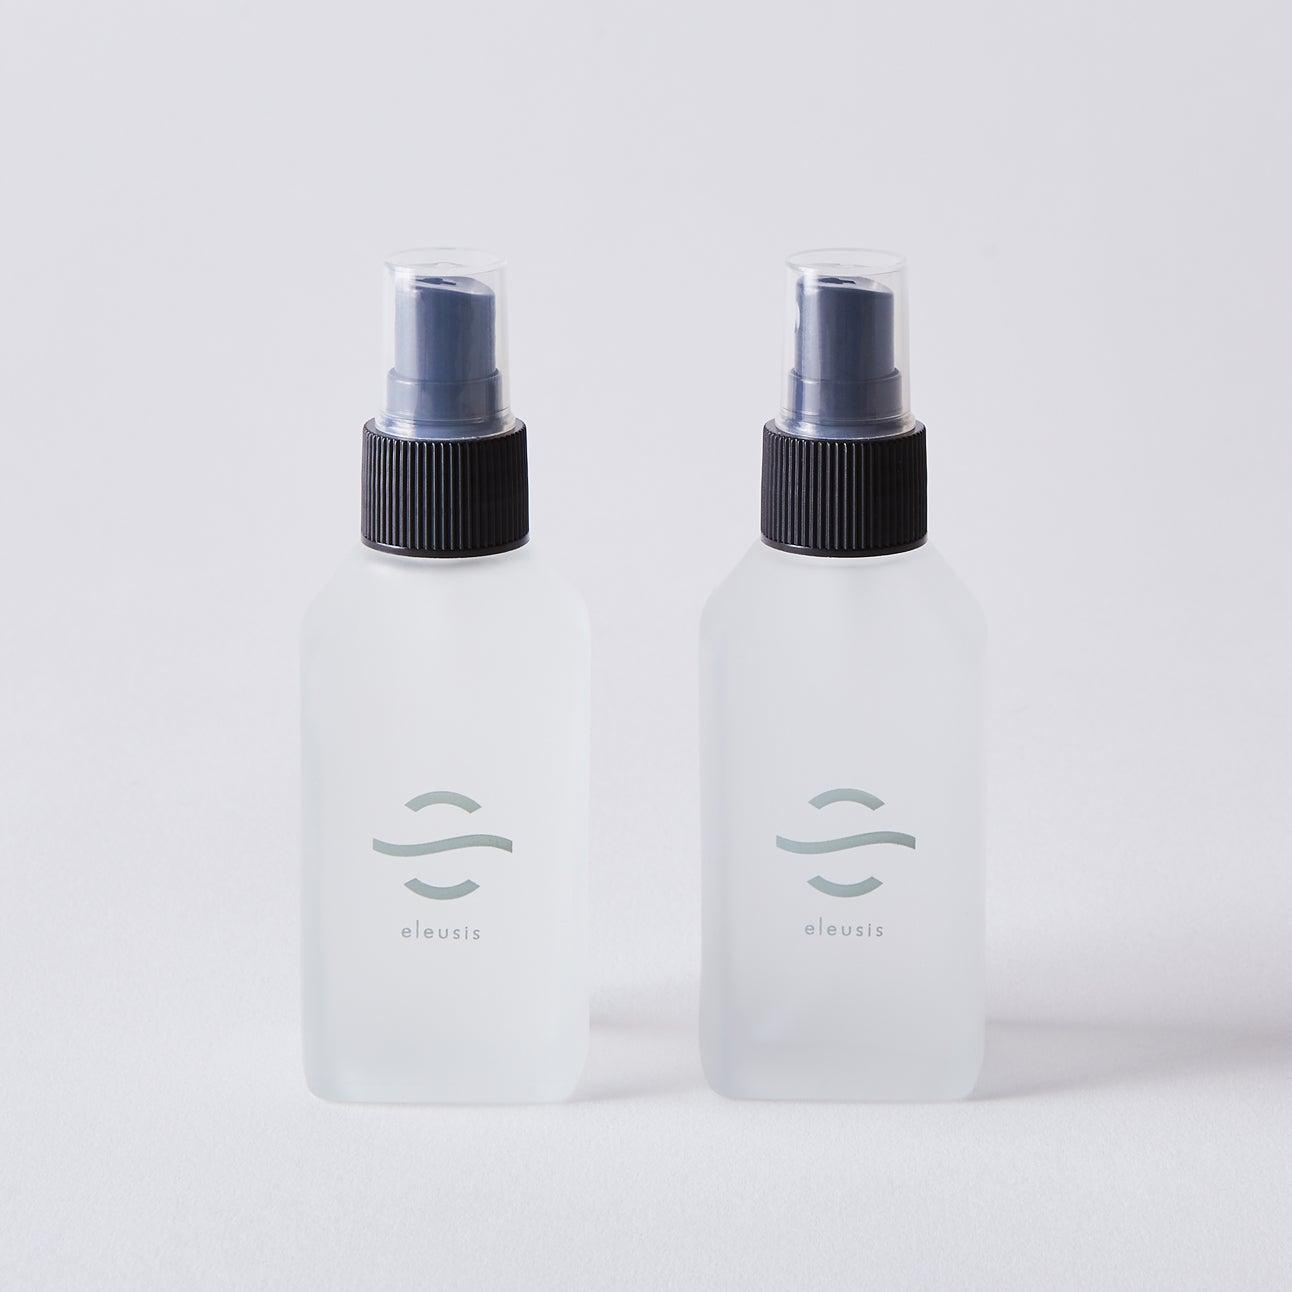 2020-0512_eleusis_organic-lavender-and-rose-hydrosol_set-of-2_silo_rocky-luten_003